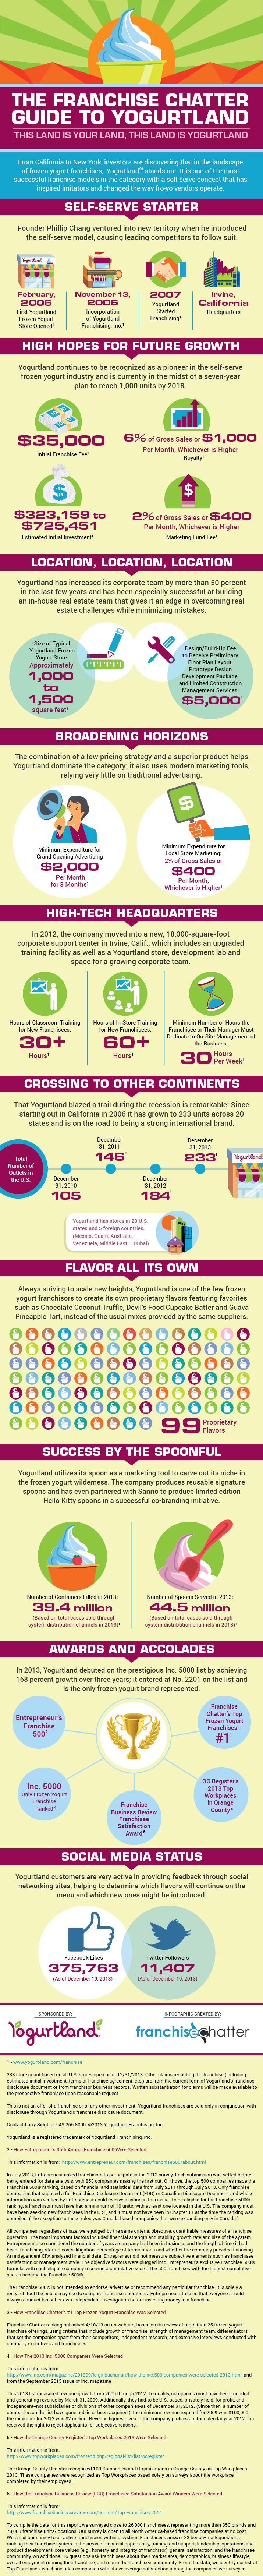 Yogurtland_infographic_715pix_09Feb